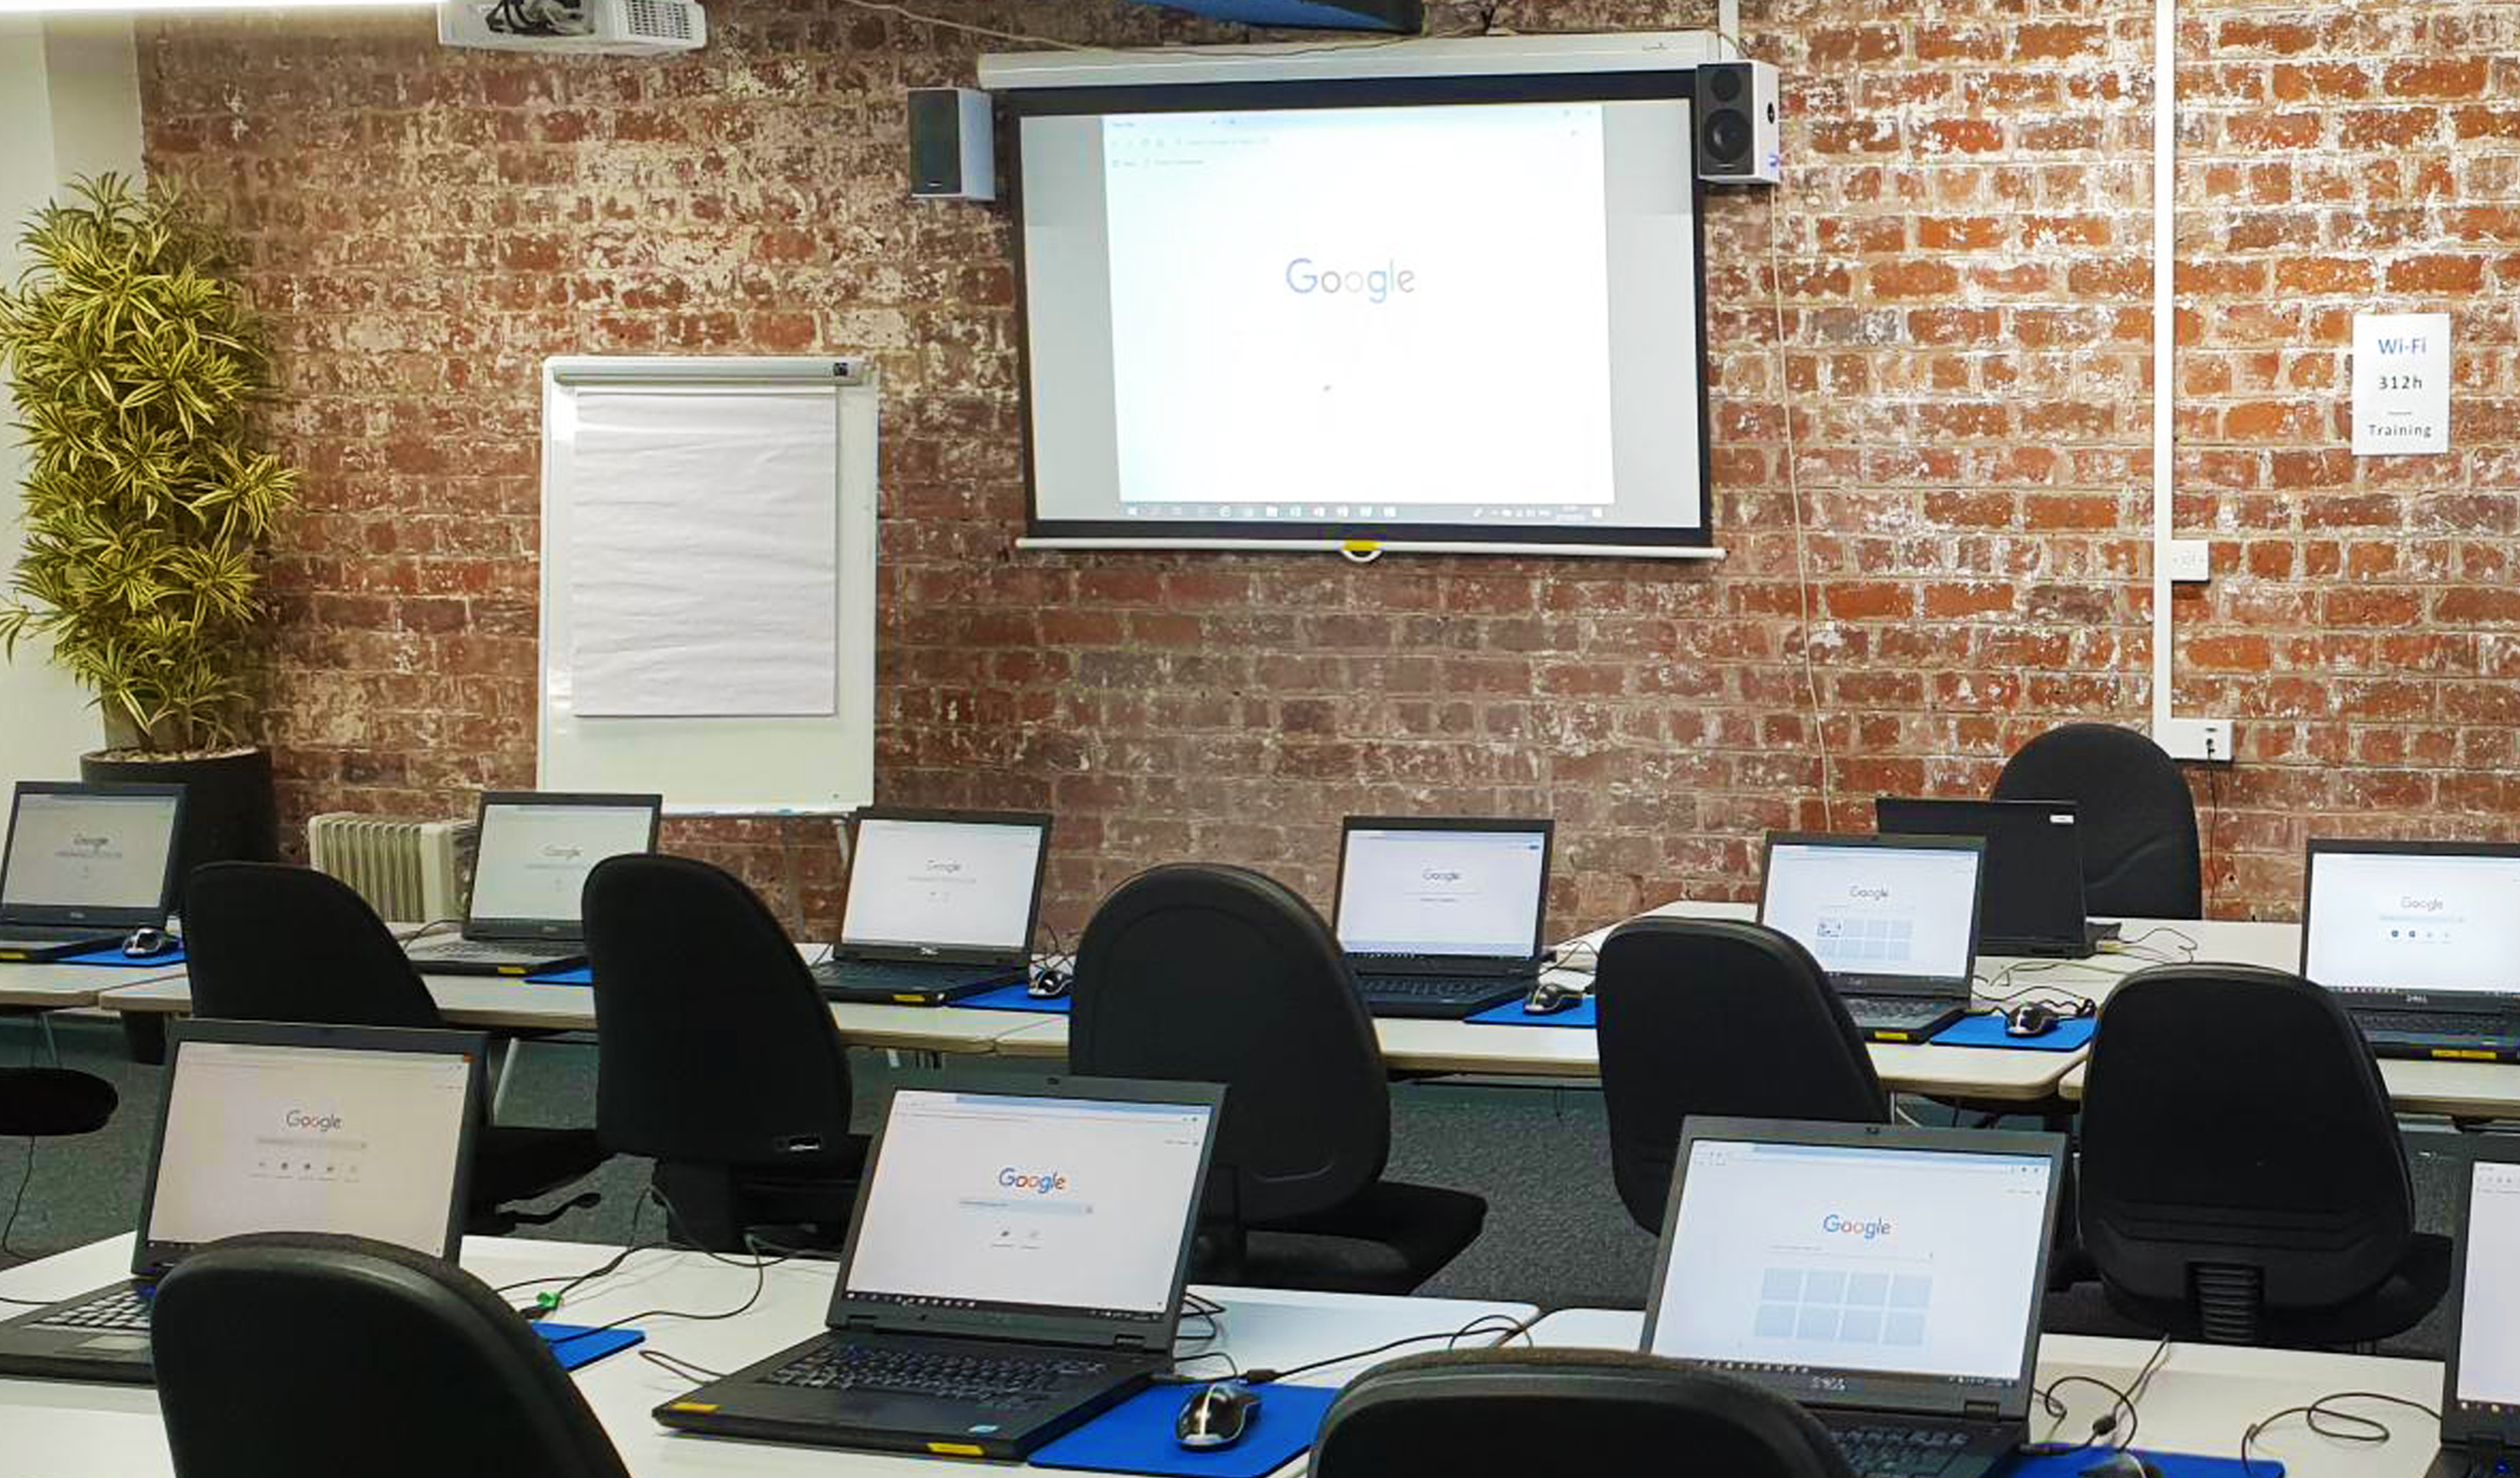 Glasgow IT Training Room Hire